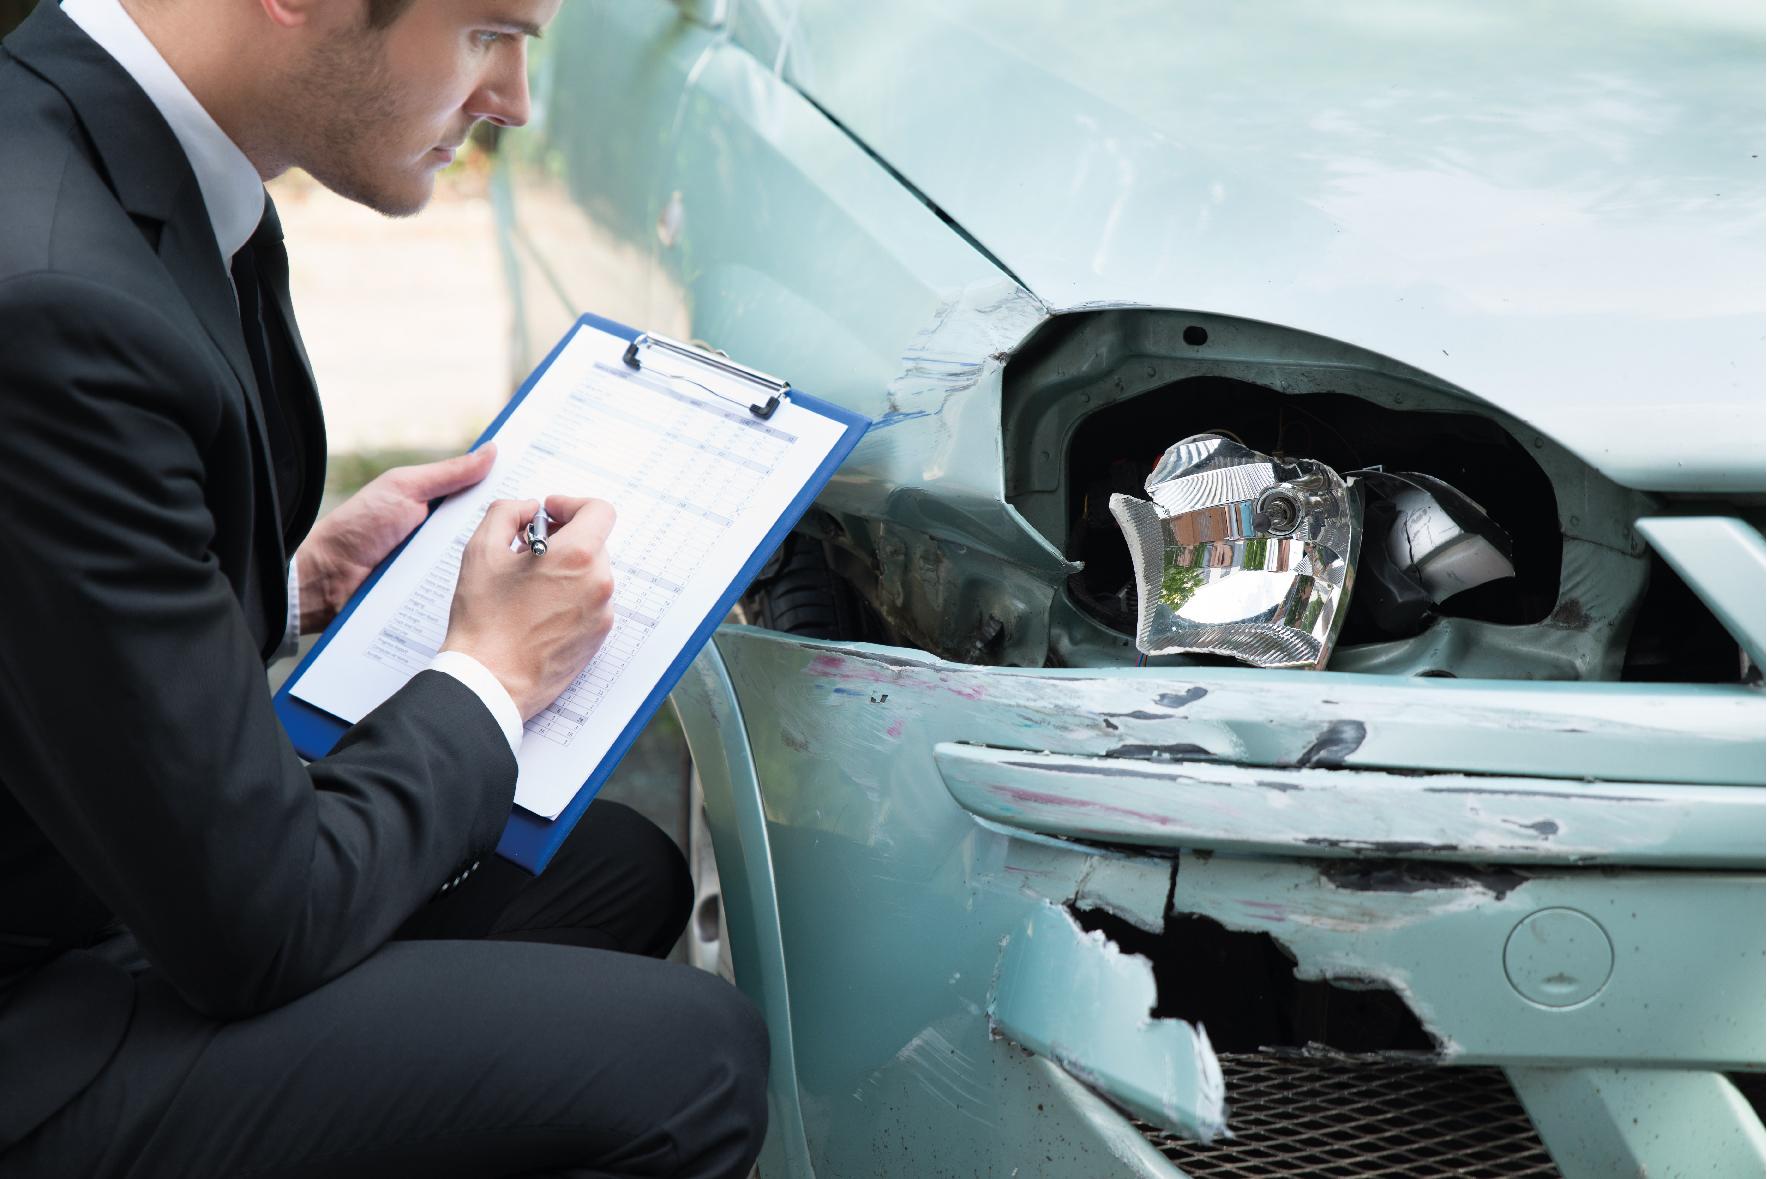 [pb-city] autoschade expert